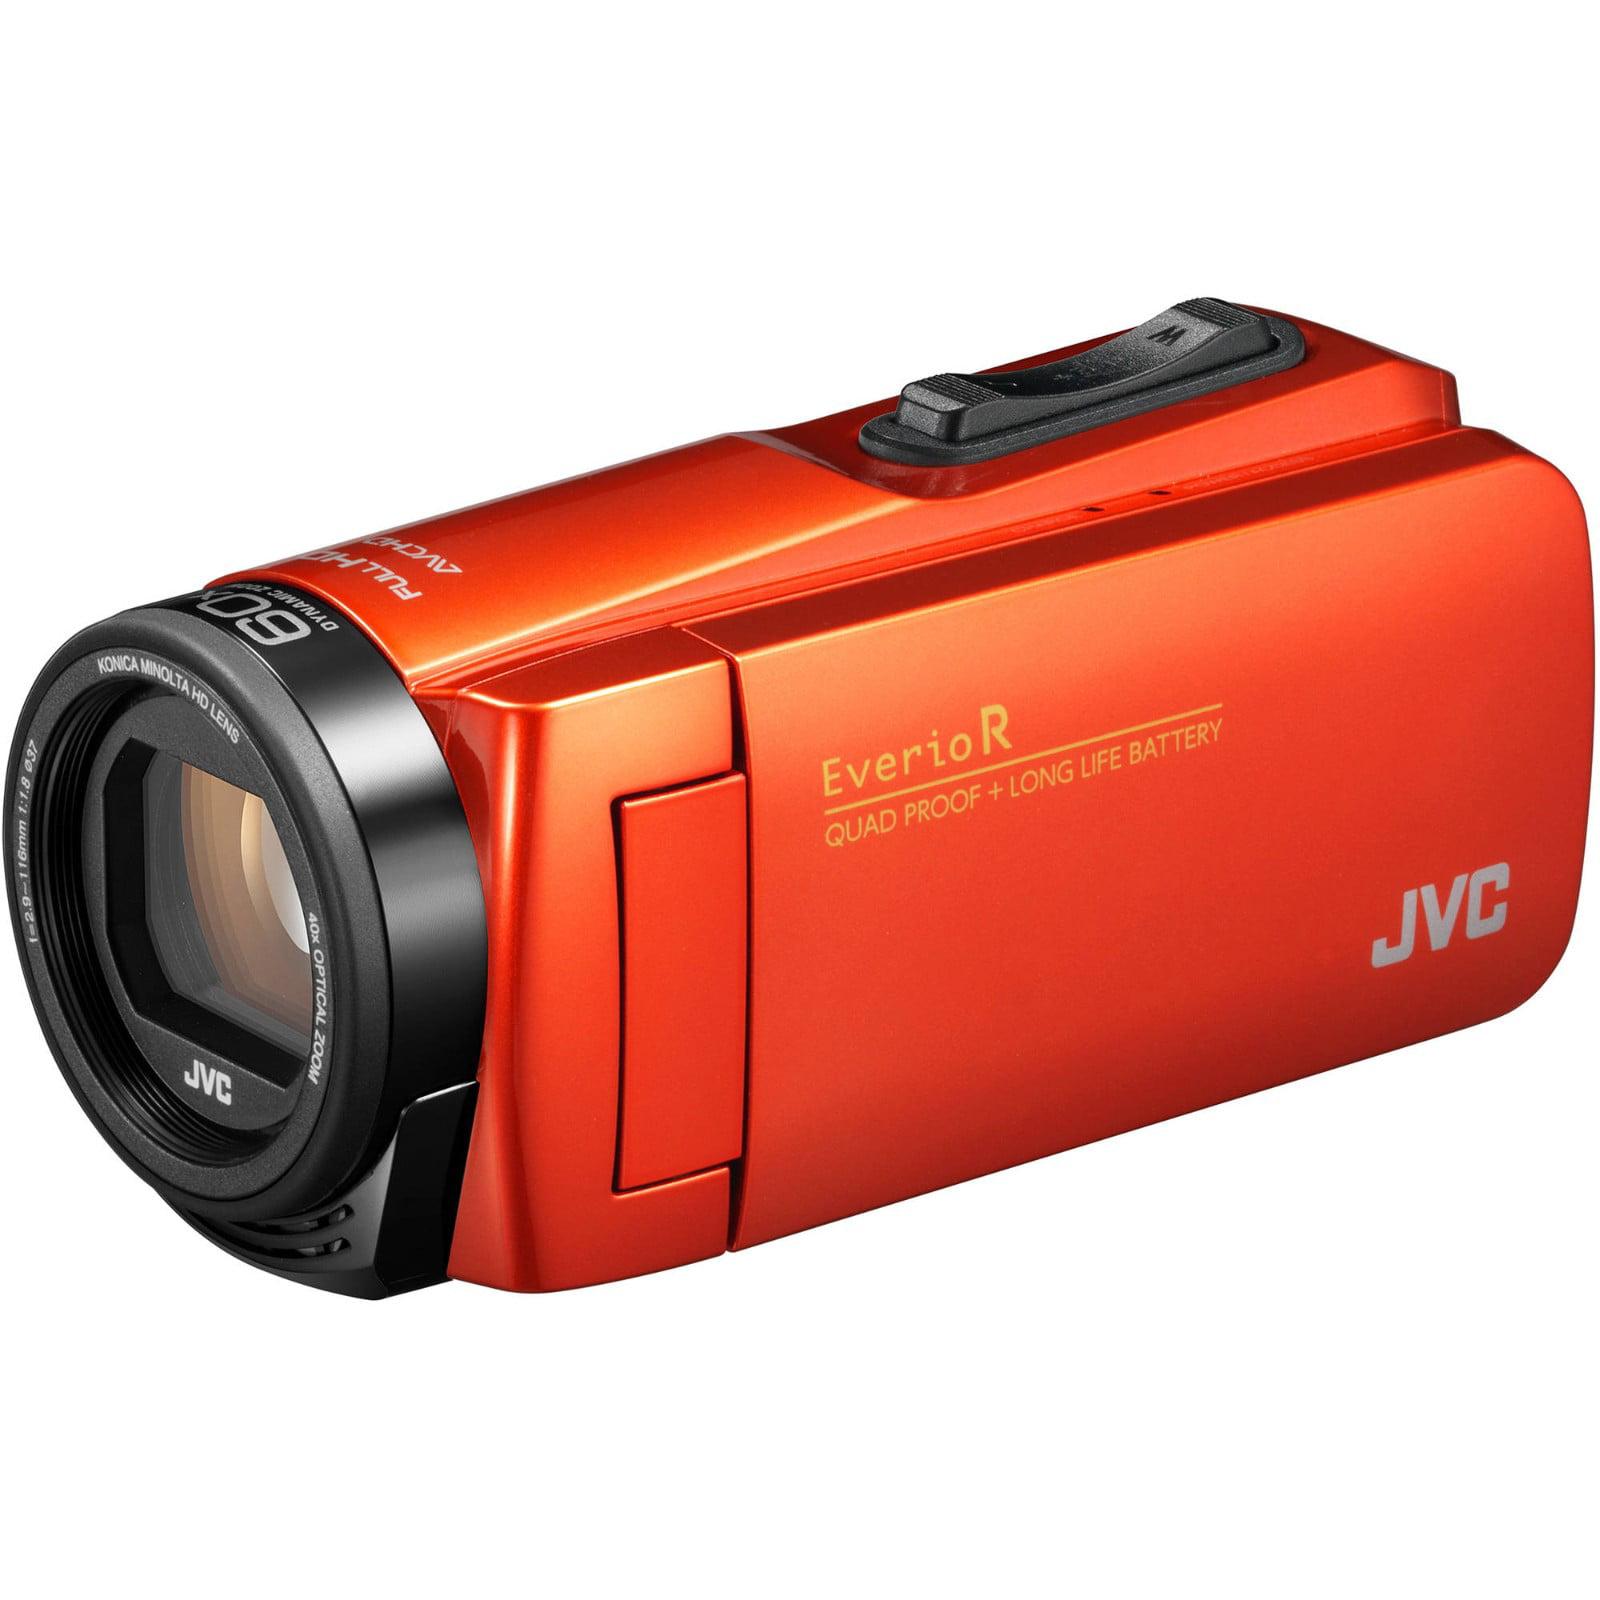 JVC Everio Quad Proof 1080p HD Video Camera Camcorder (Black)